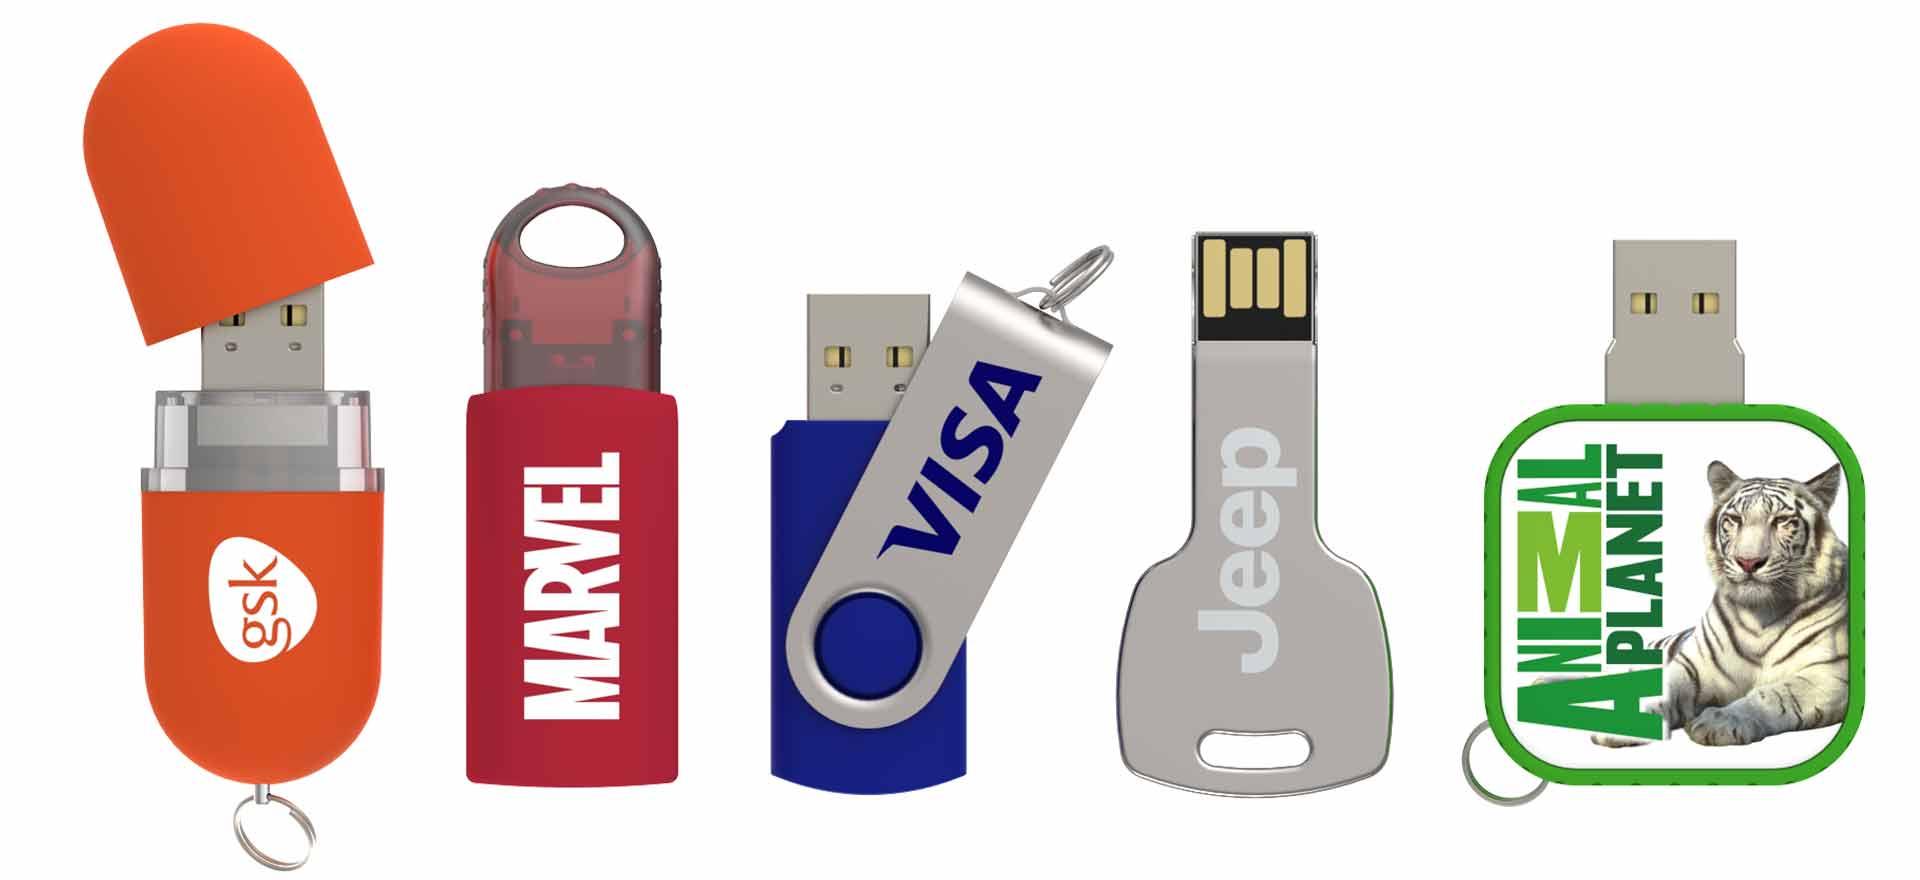 USB Sticks in 5 Days!